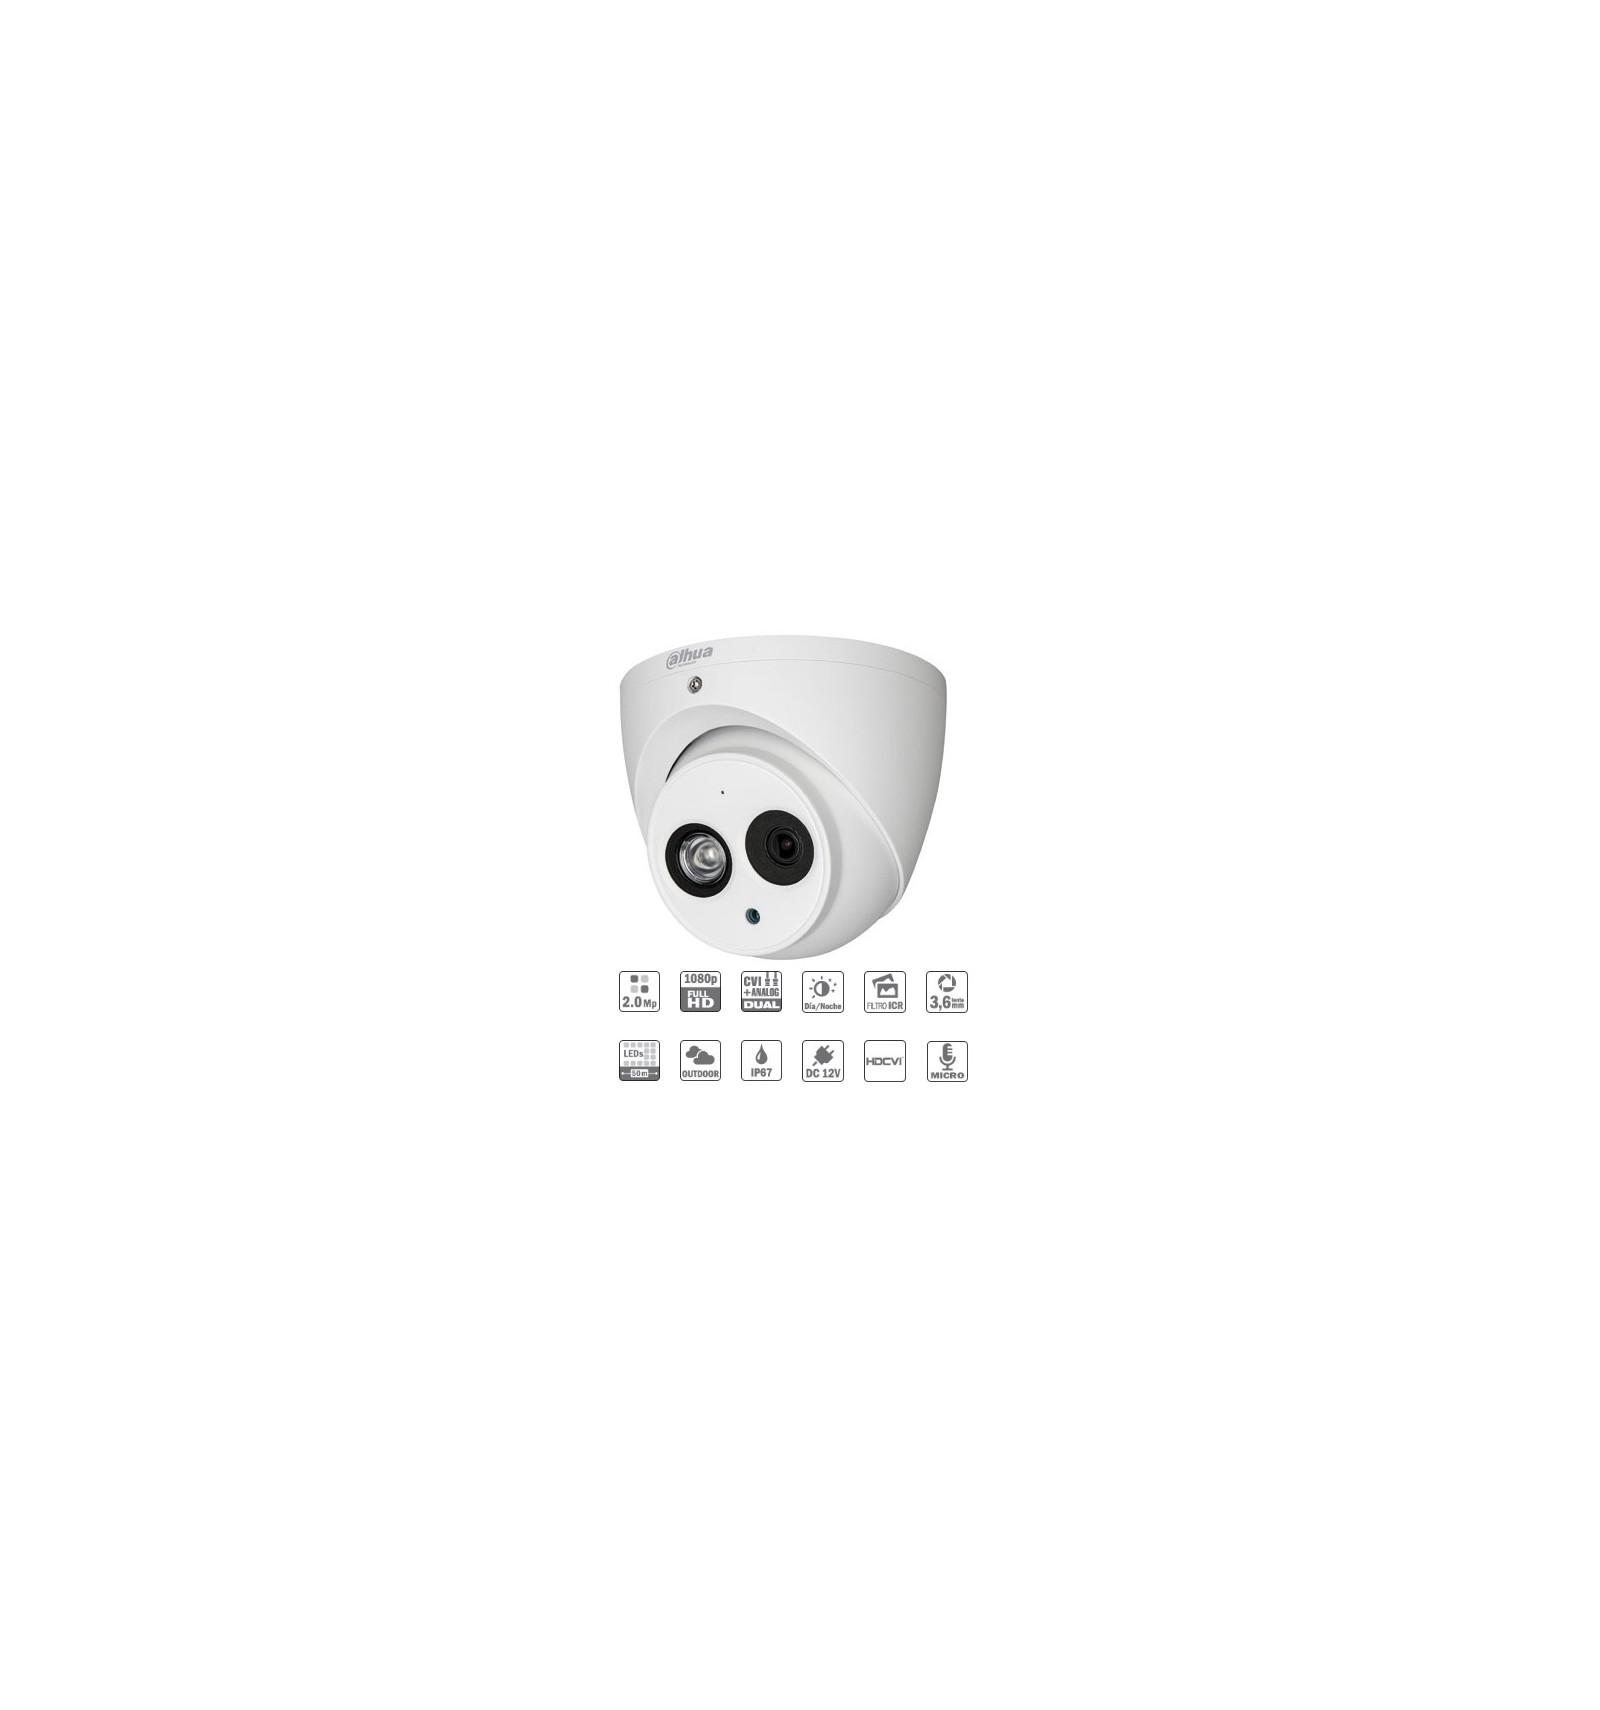 Camara de vigilancia exterior domo hdcvi 2m 1080p dn icr - Camaras vigilancia exterior ...